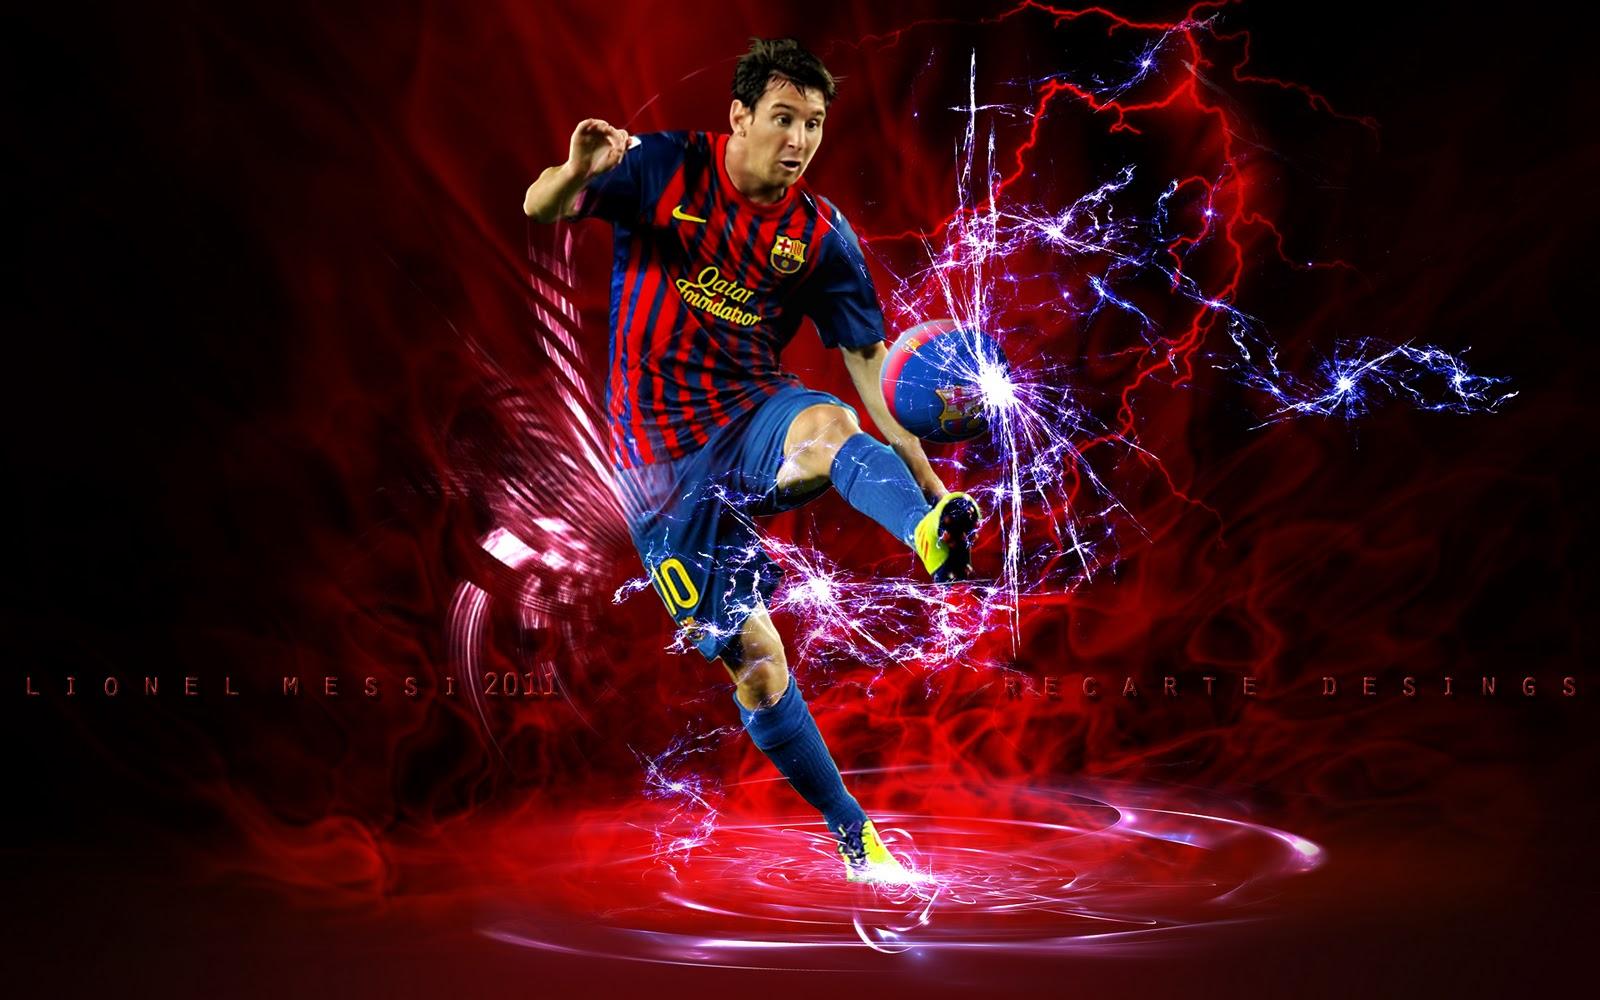 Lionel Messi Wallpapers  Sportwallpapers